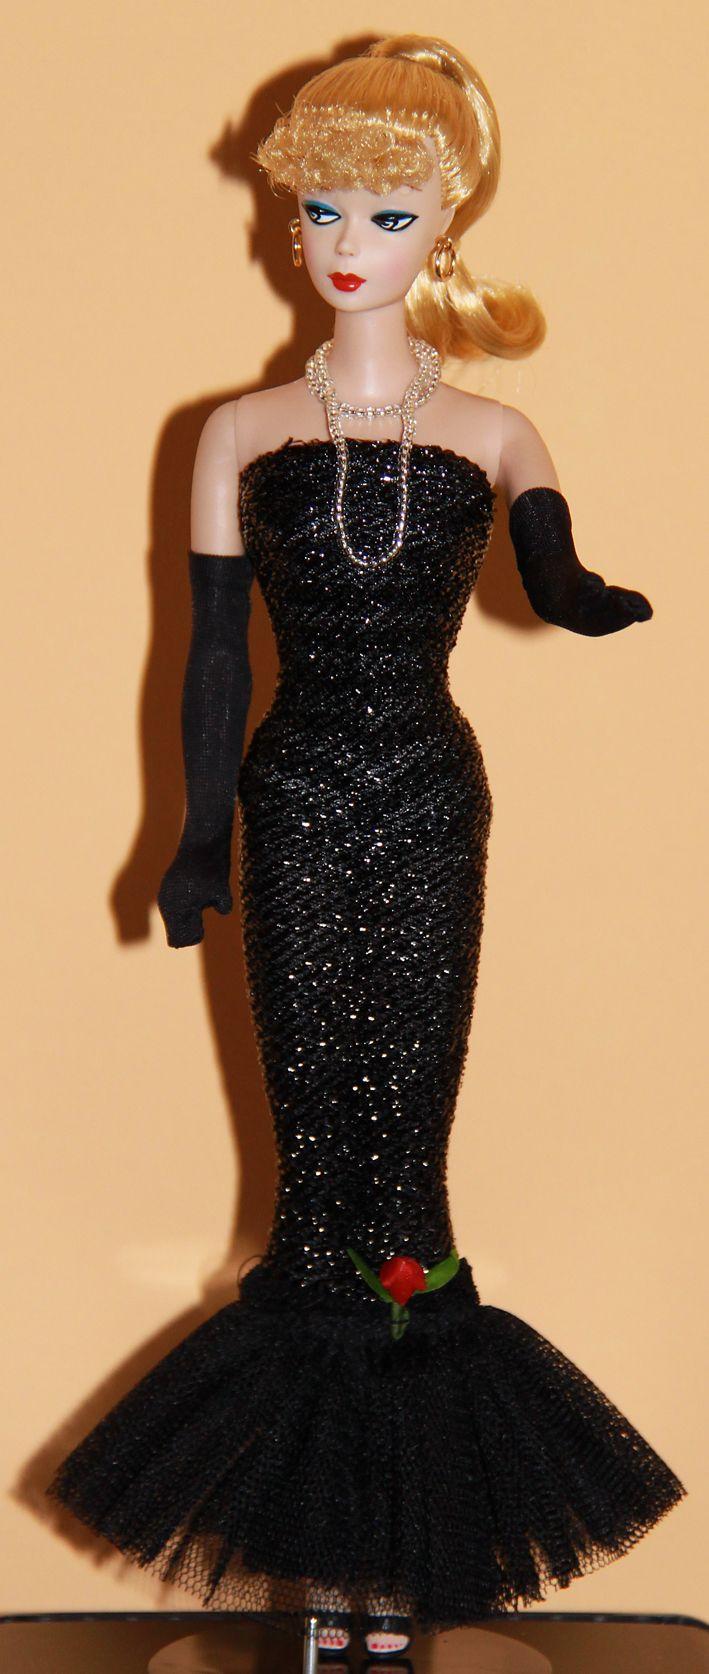 Vintage Barbie Doll Collectors 113